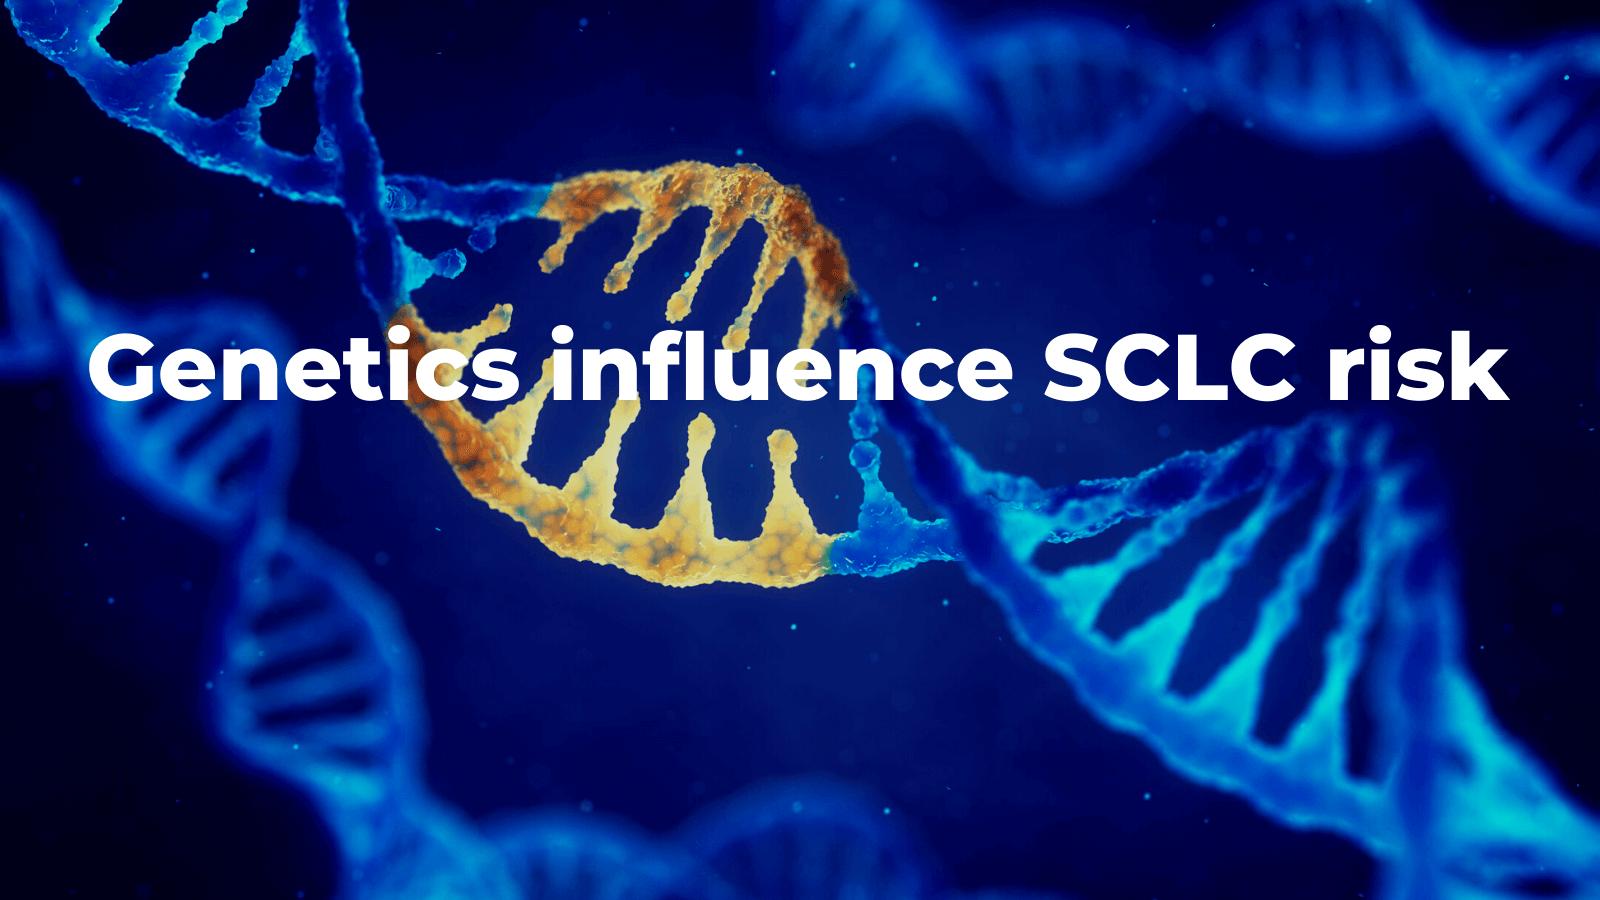 Genetics influence SCLC risk